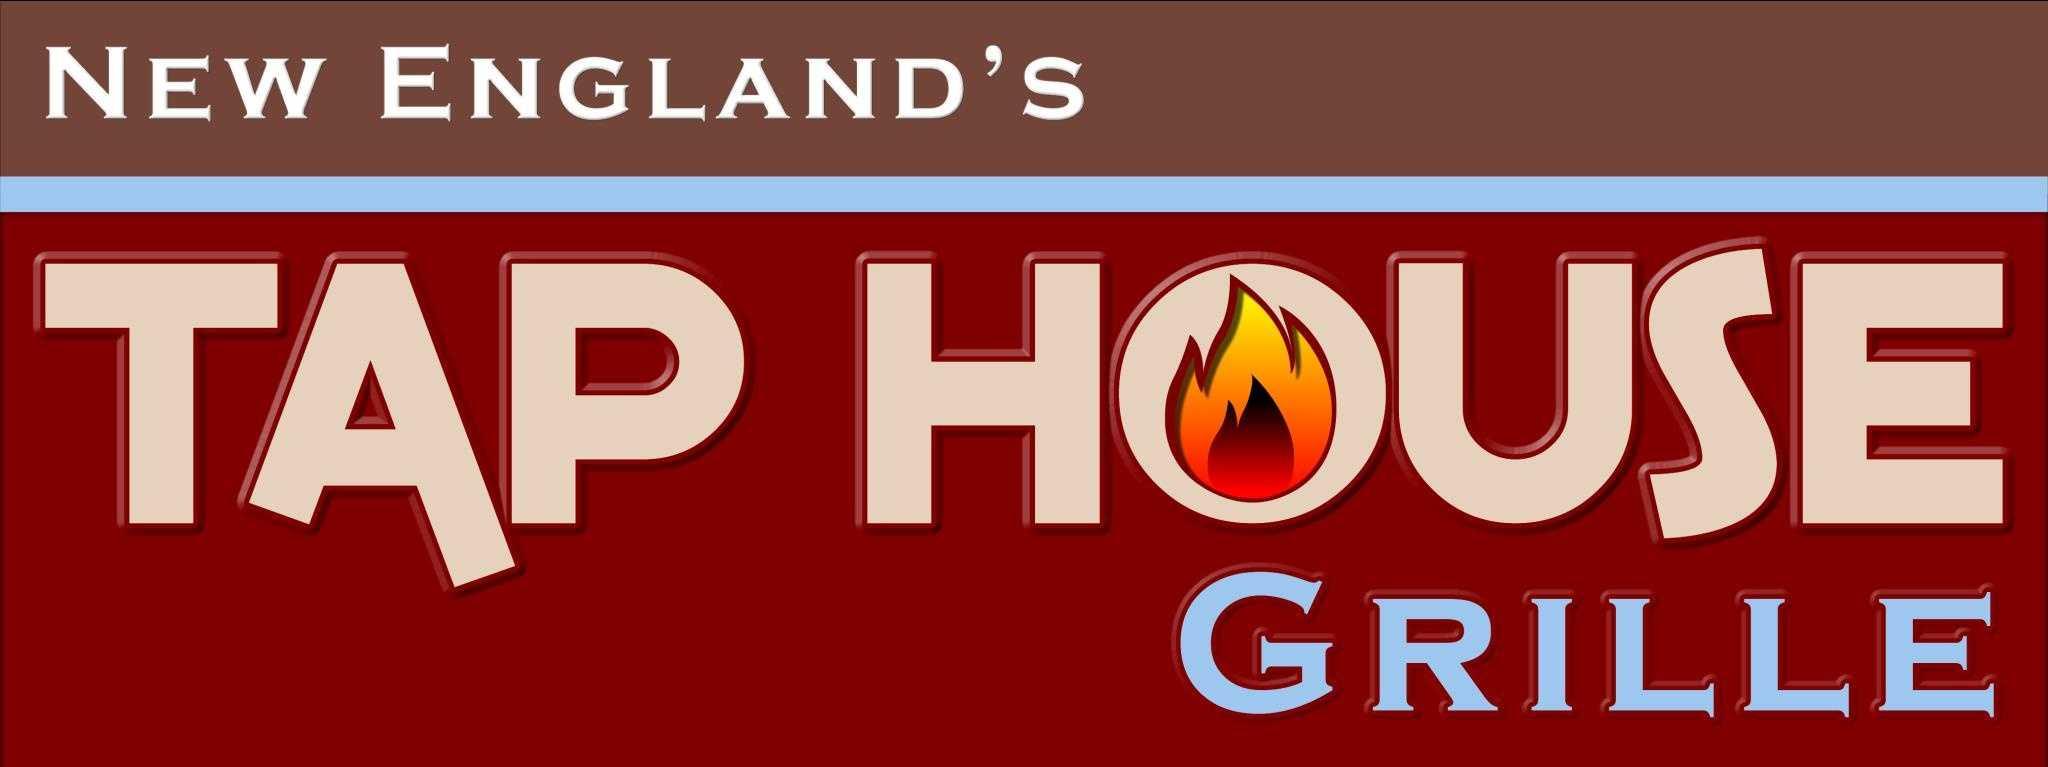 13. New England's Tap House Grille in Hooksett